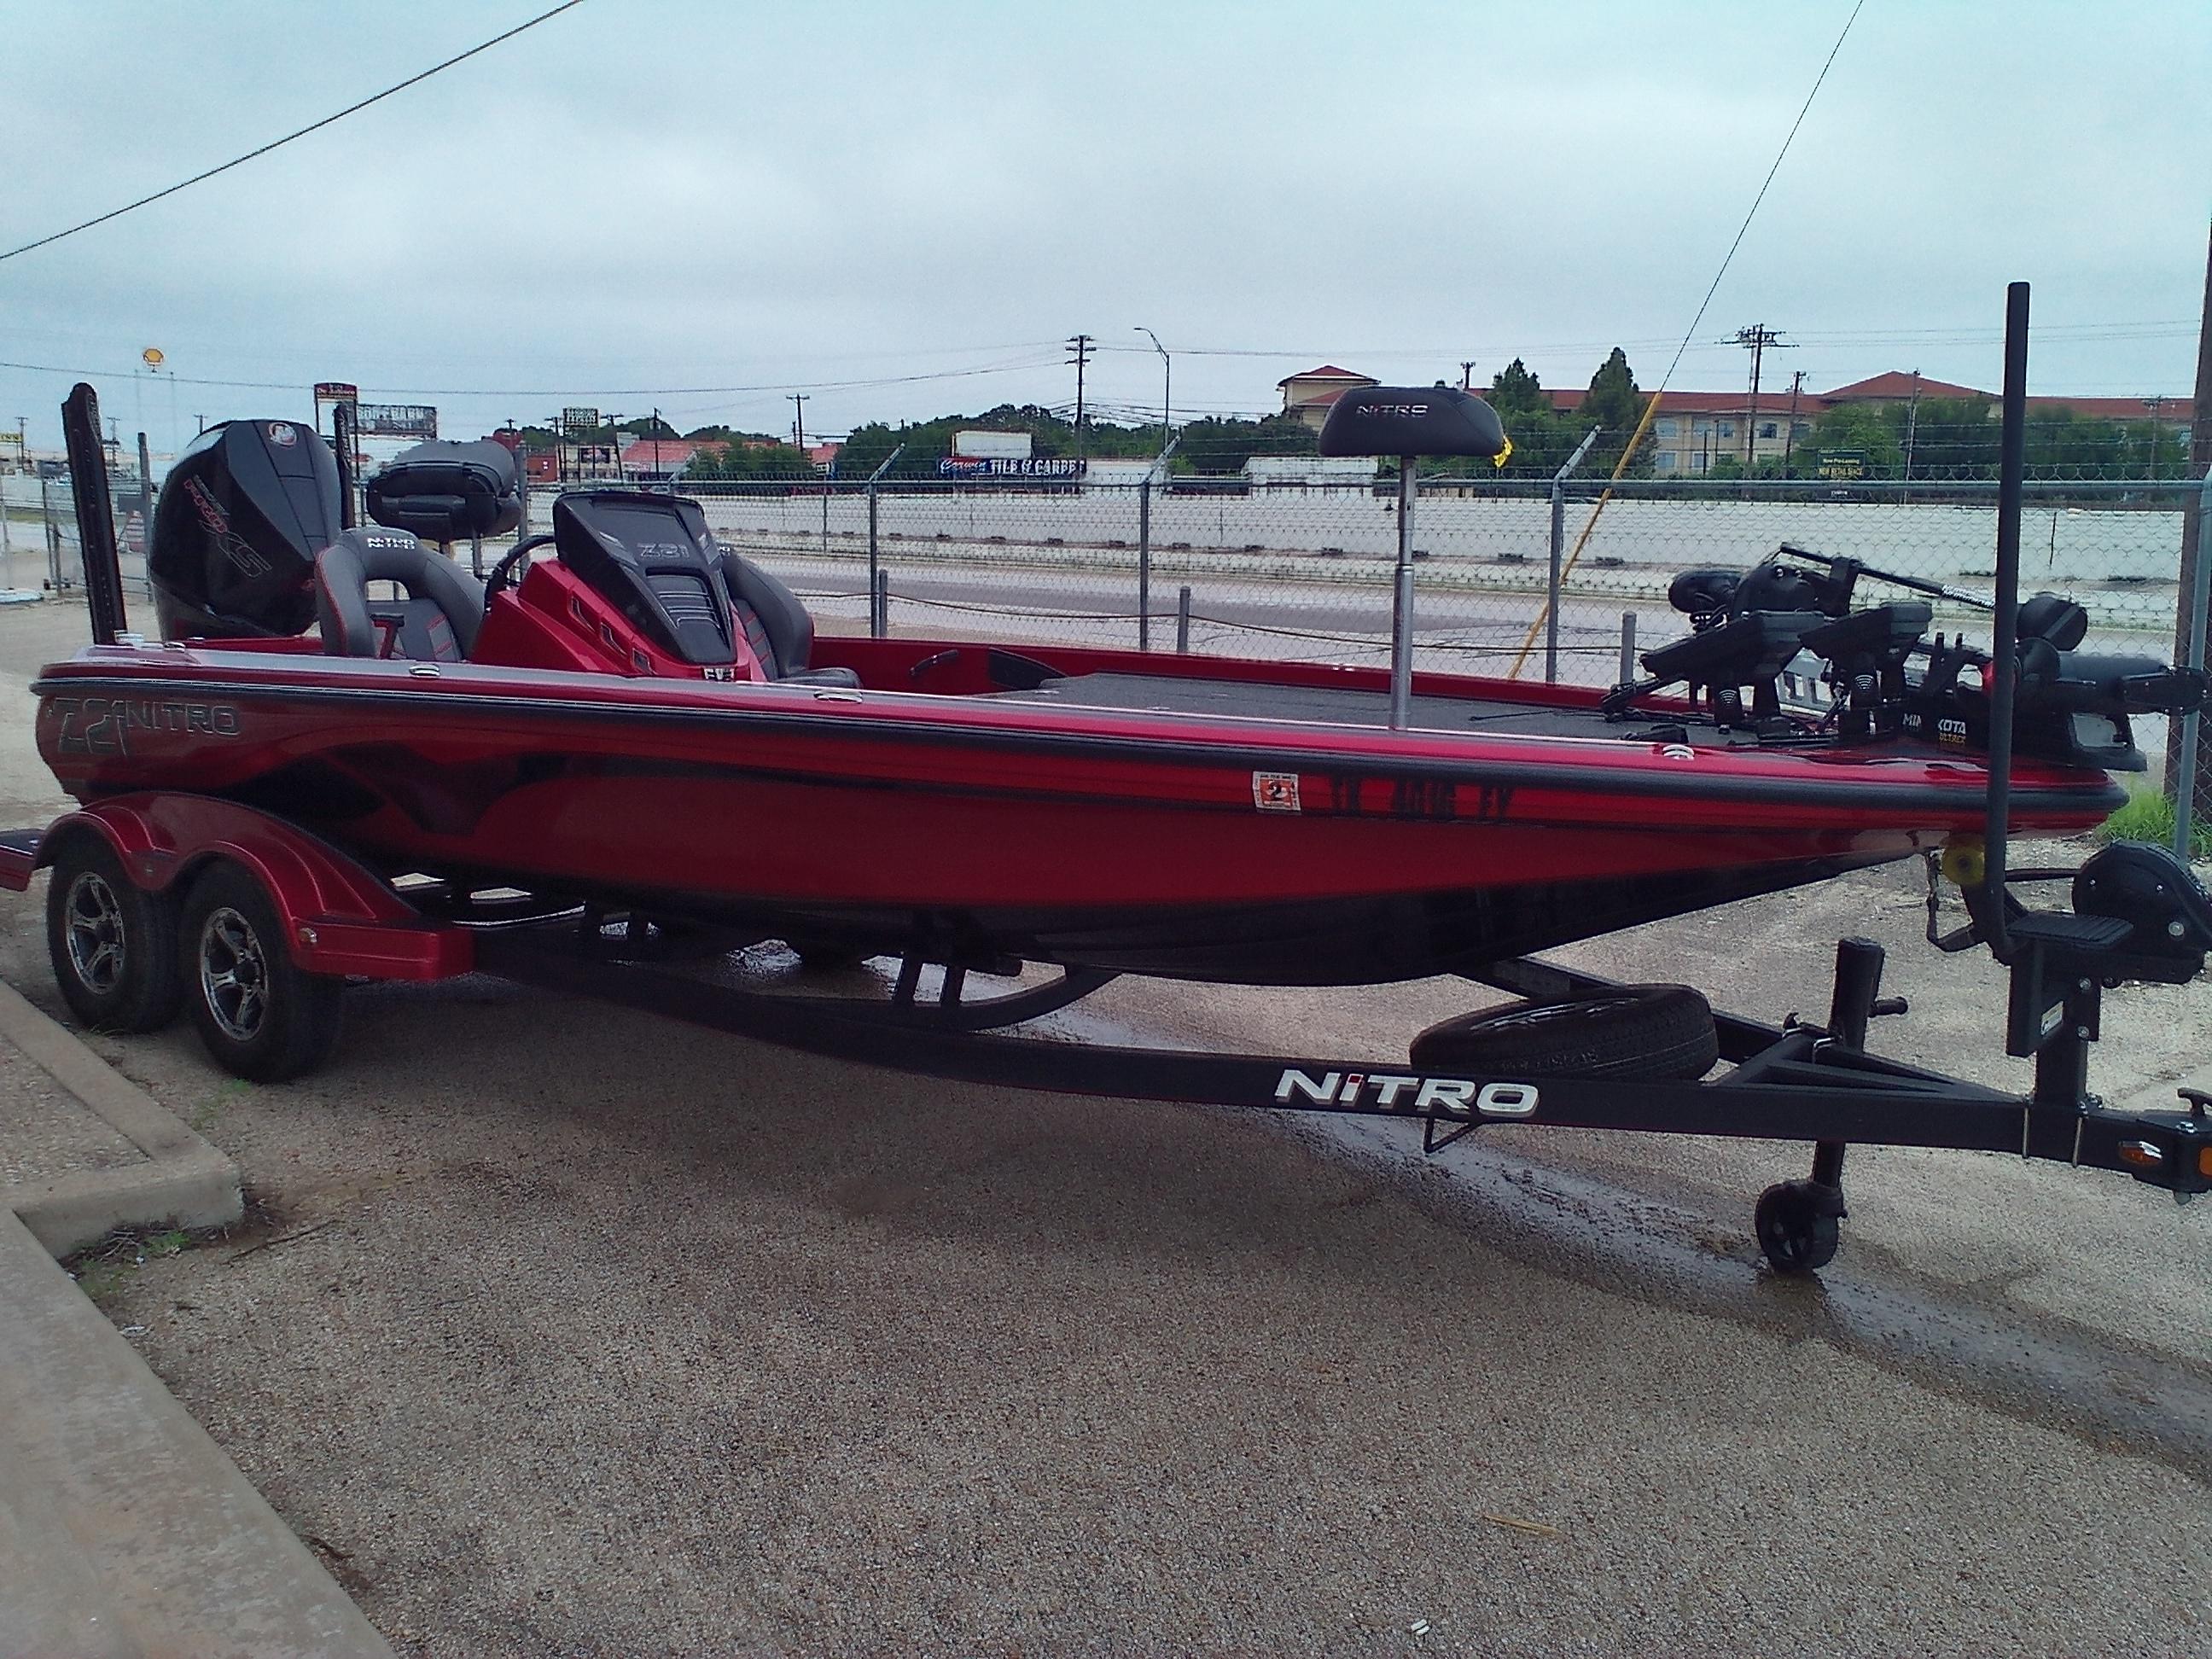 2020 Nitro boat for sale, model of the boat is Z21 & Image # 2 of 11